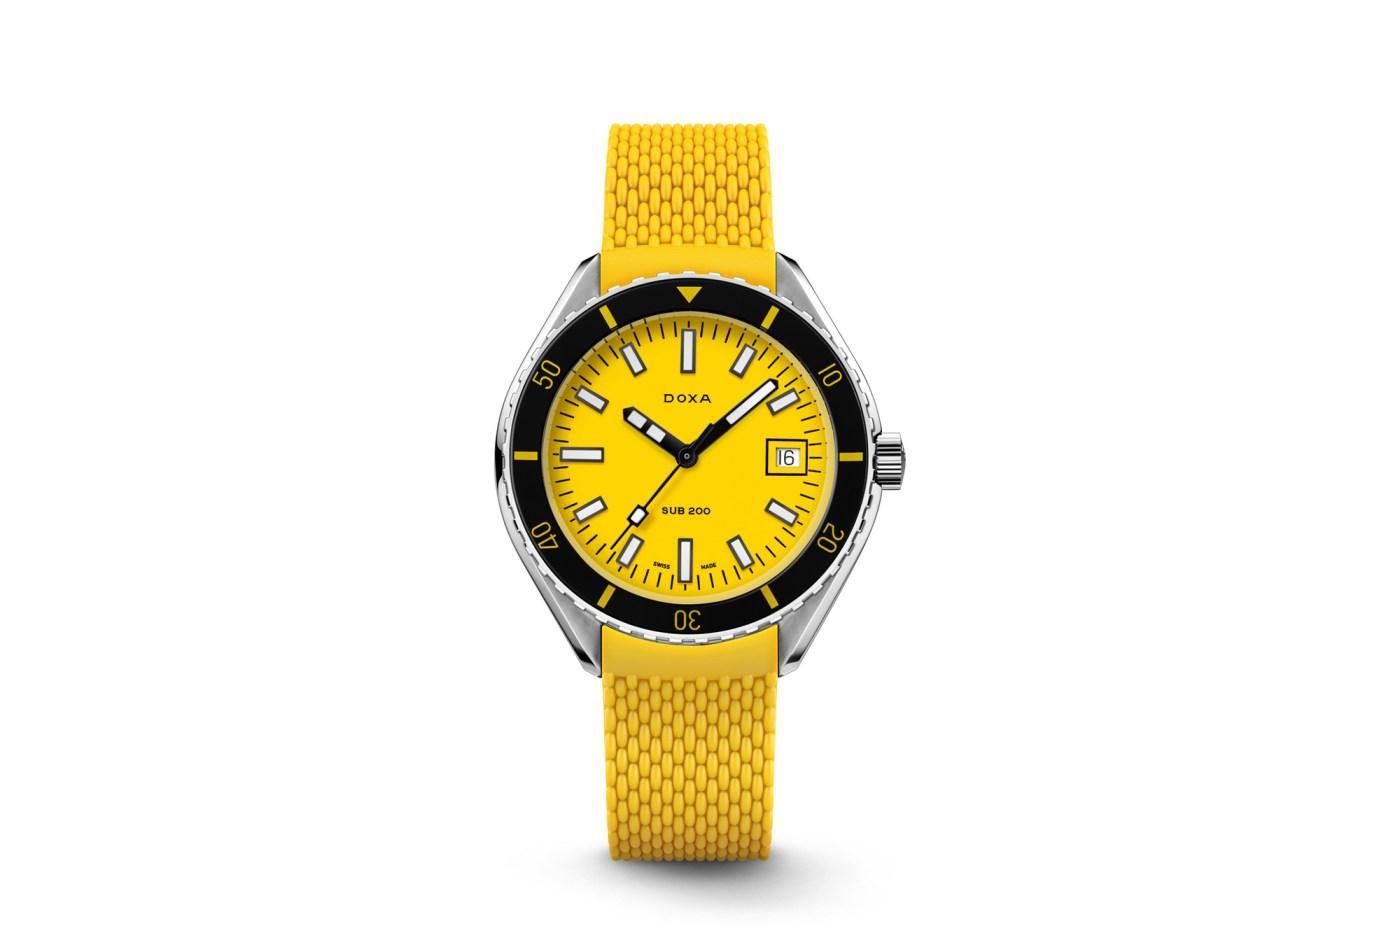 Doxa Sub 200 Yellow rubber strap